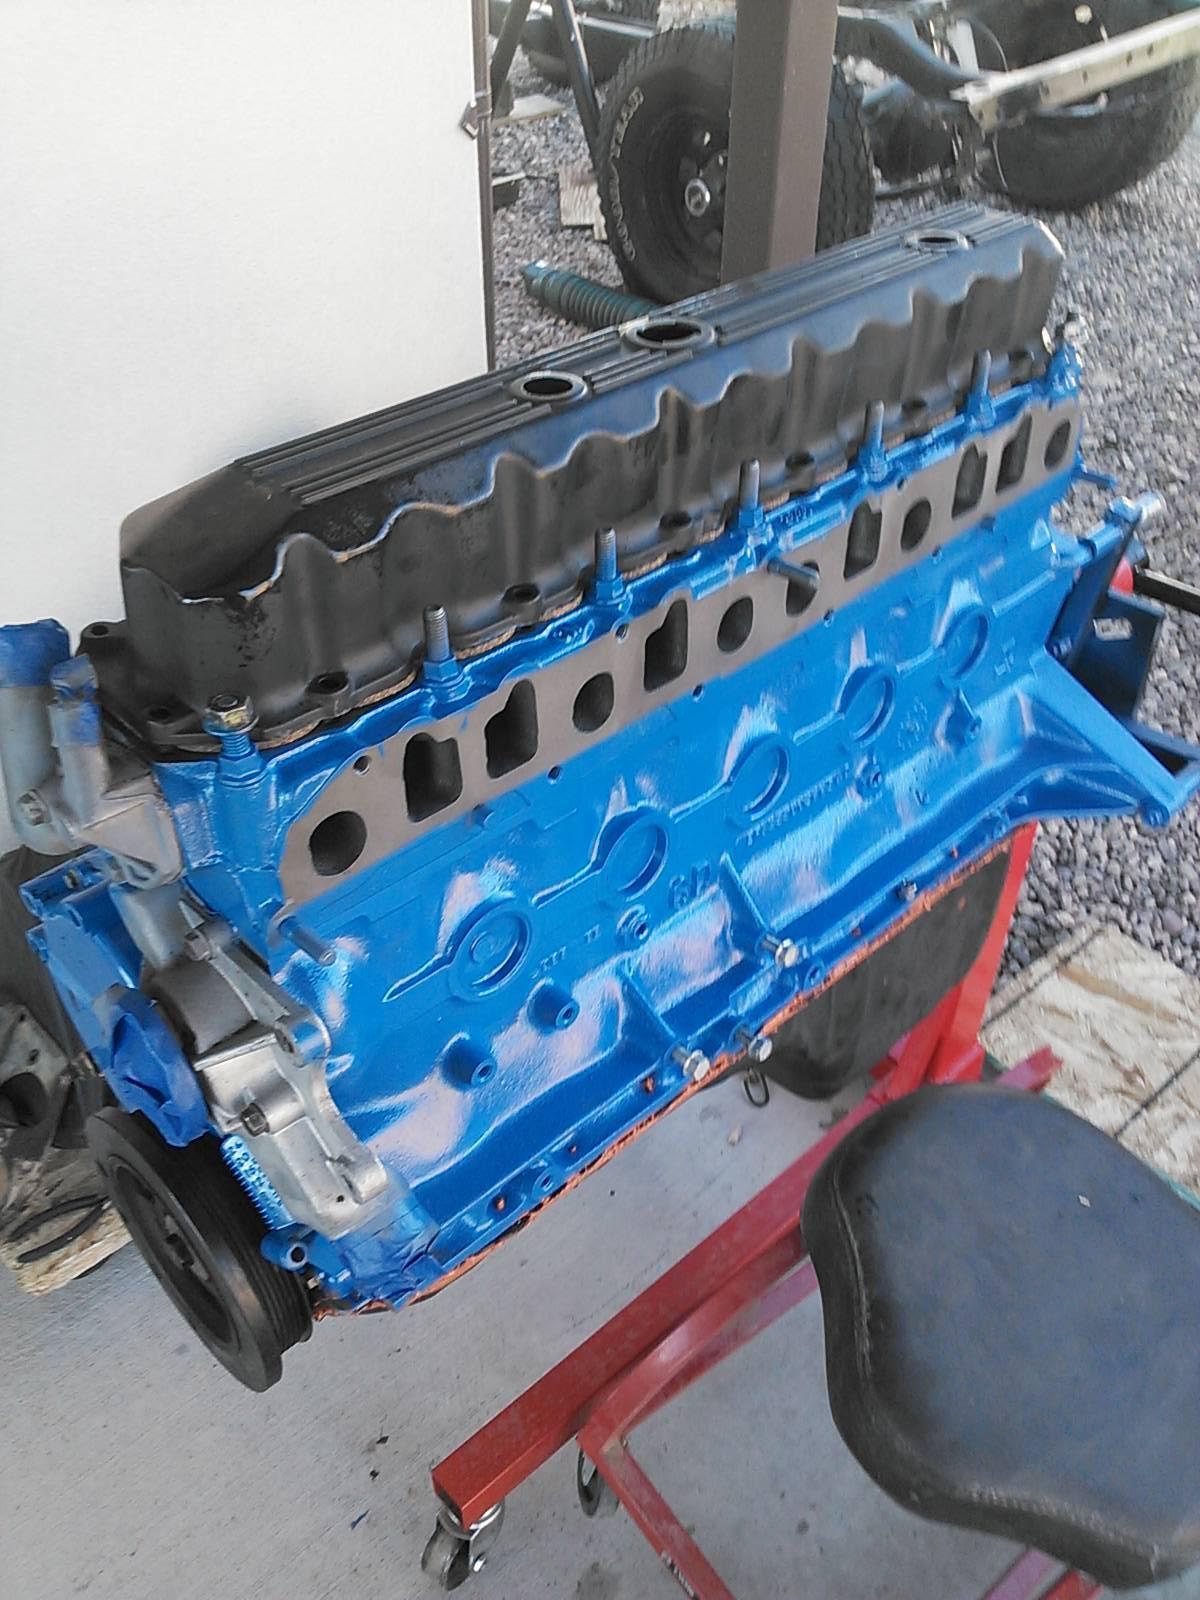 1985 Jeep Cj7 With A 40l Carbureted Engine Swap 1972 86 Amc Cj Wiring Harness Ncm 0161